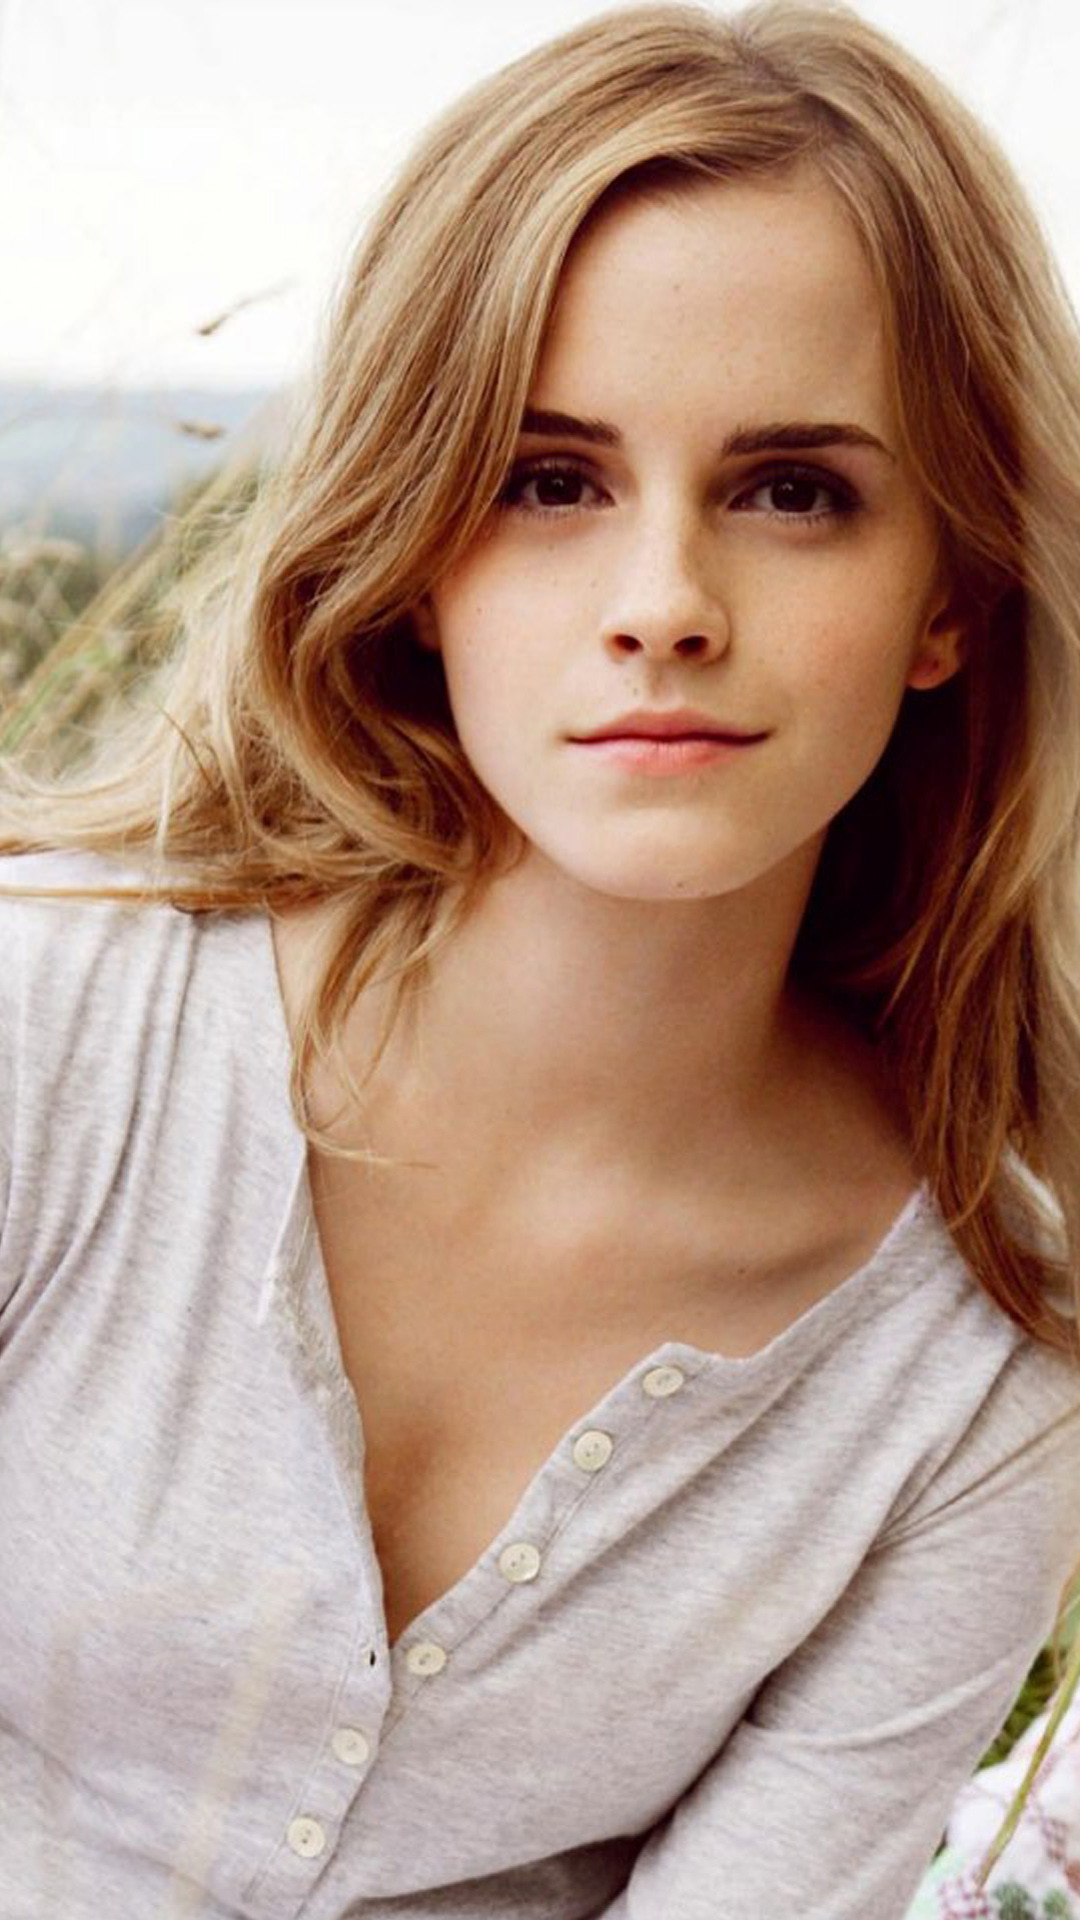 Emma Watson iPhone Wallpaper (85+ images)